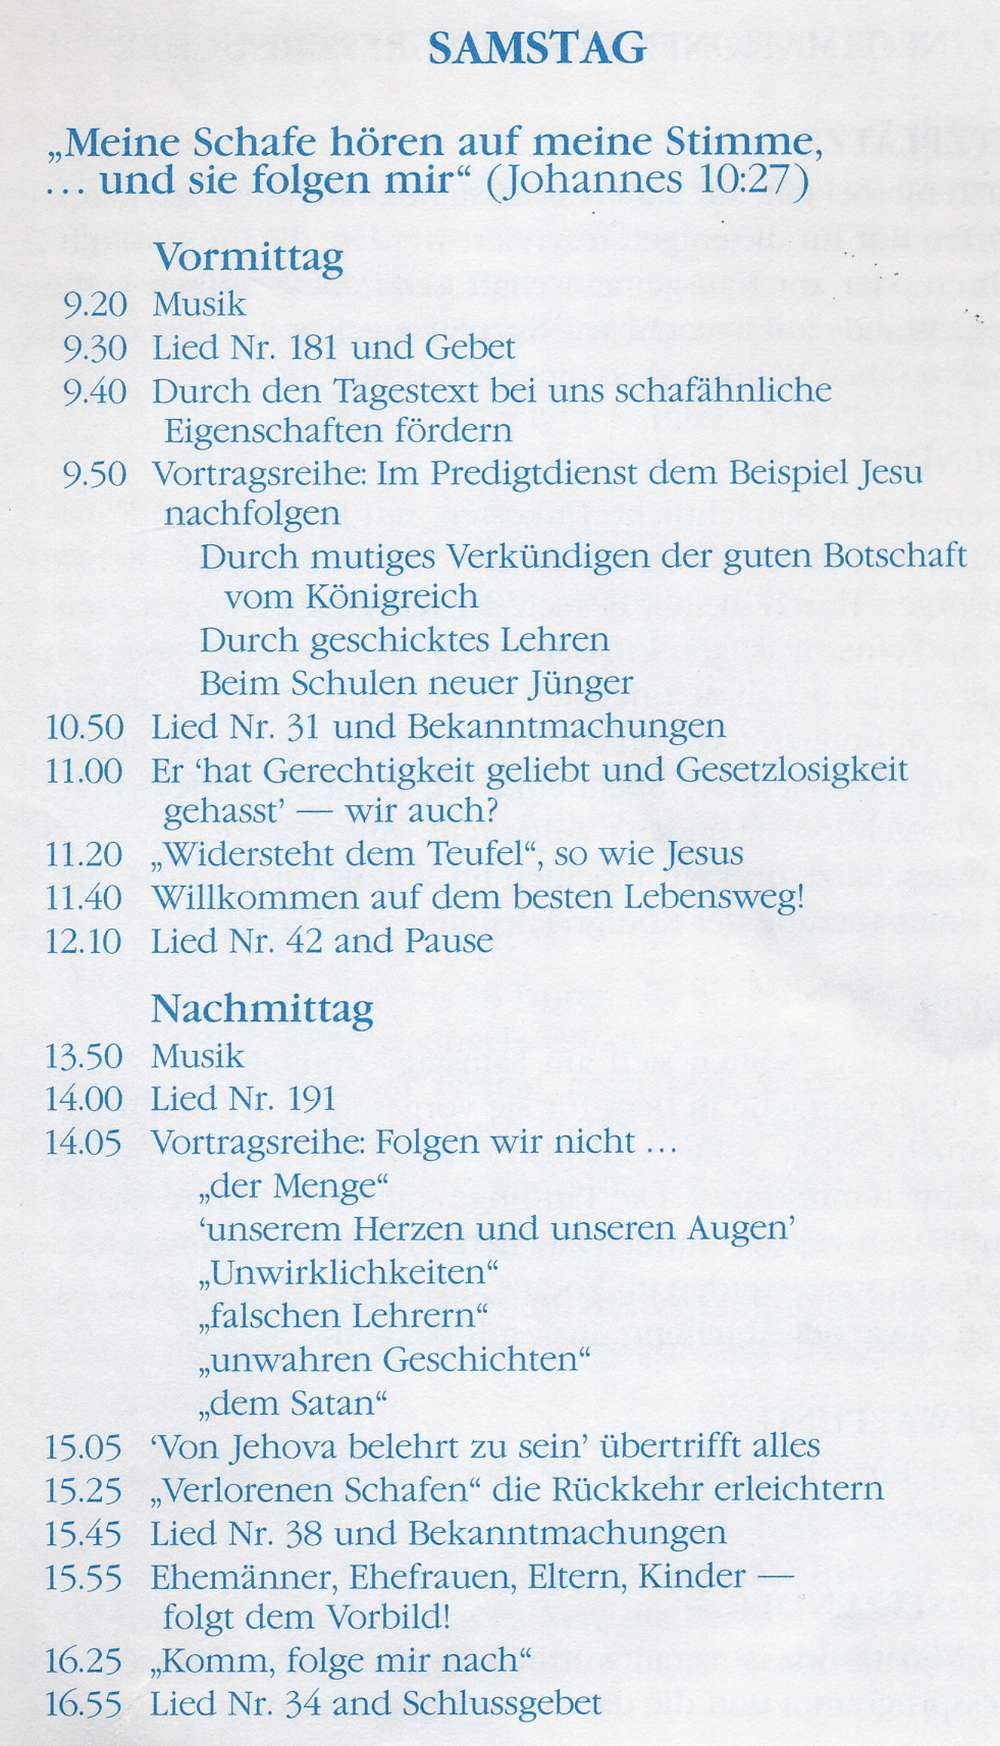 picture: http://www.manfred-gebhard.de/ReFile0002-56.jpg